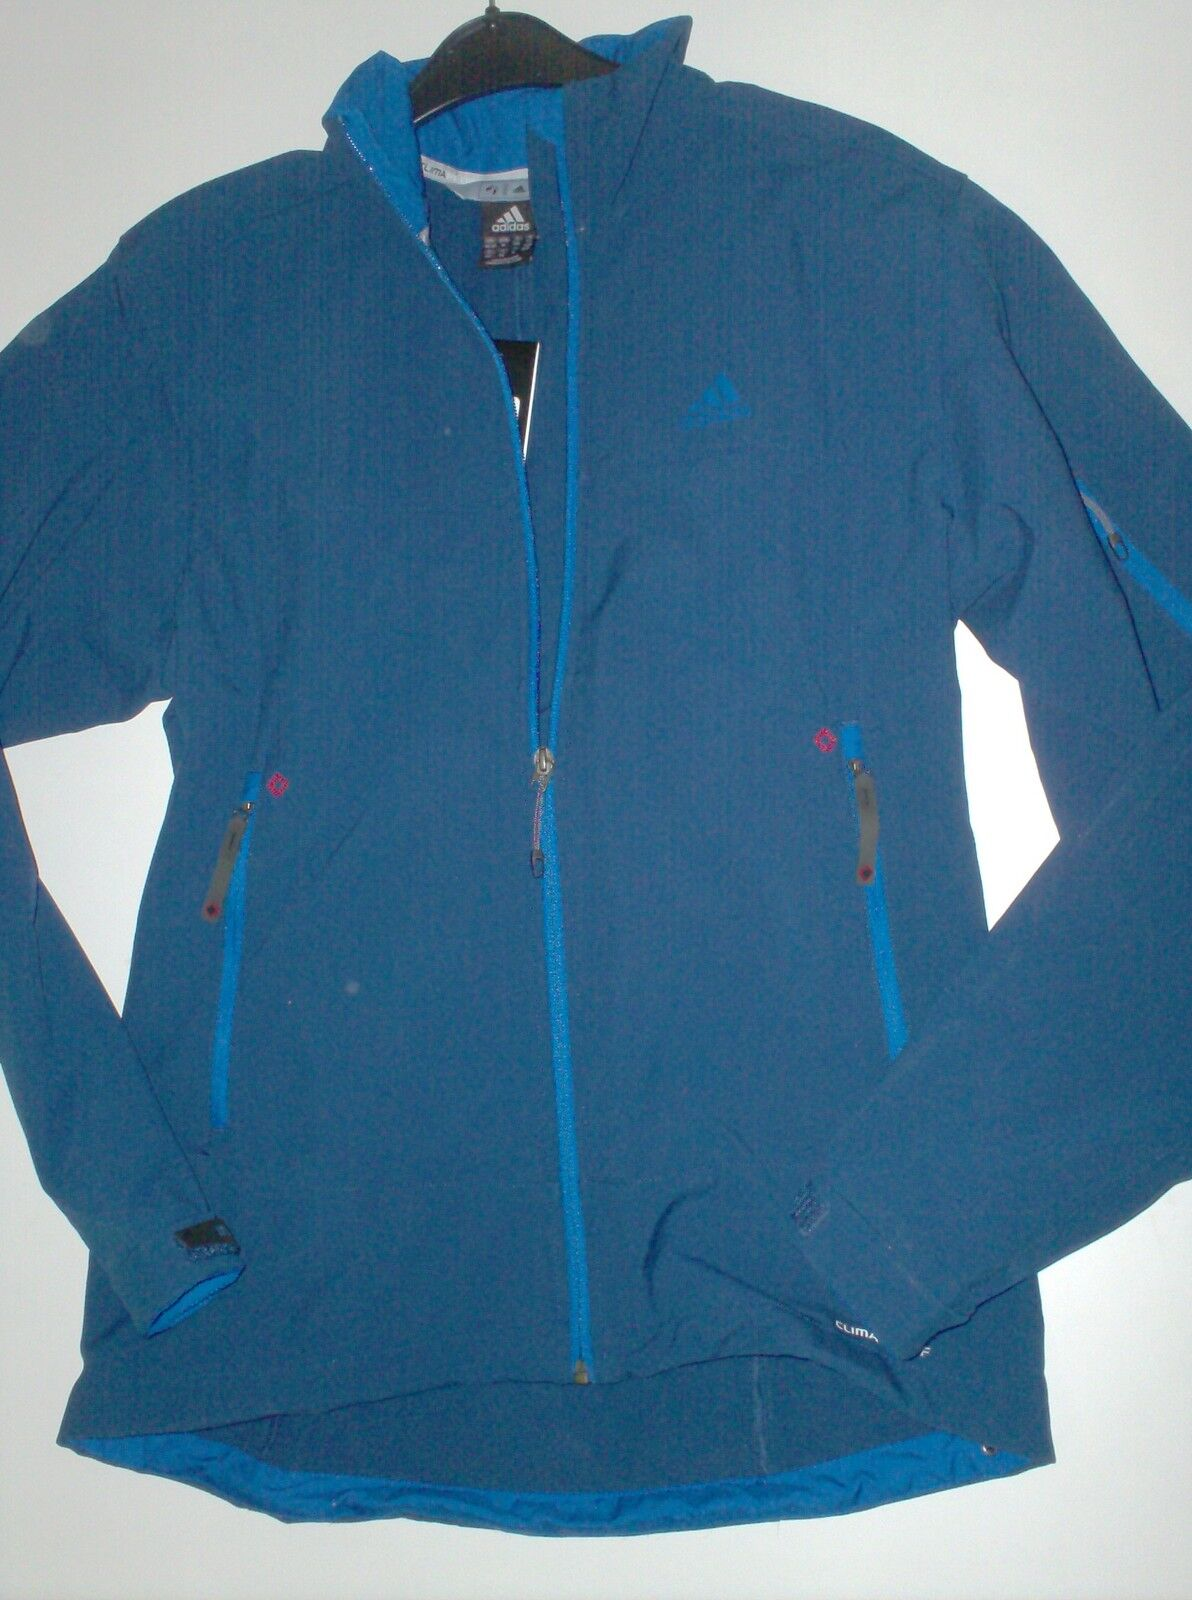 Adidas Hiking Cpw señores Softshell chaqueta p92577 talla 52